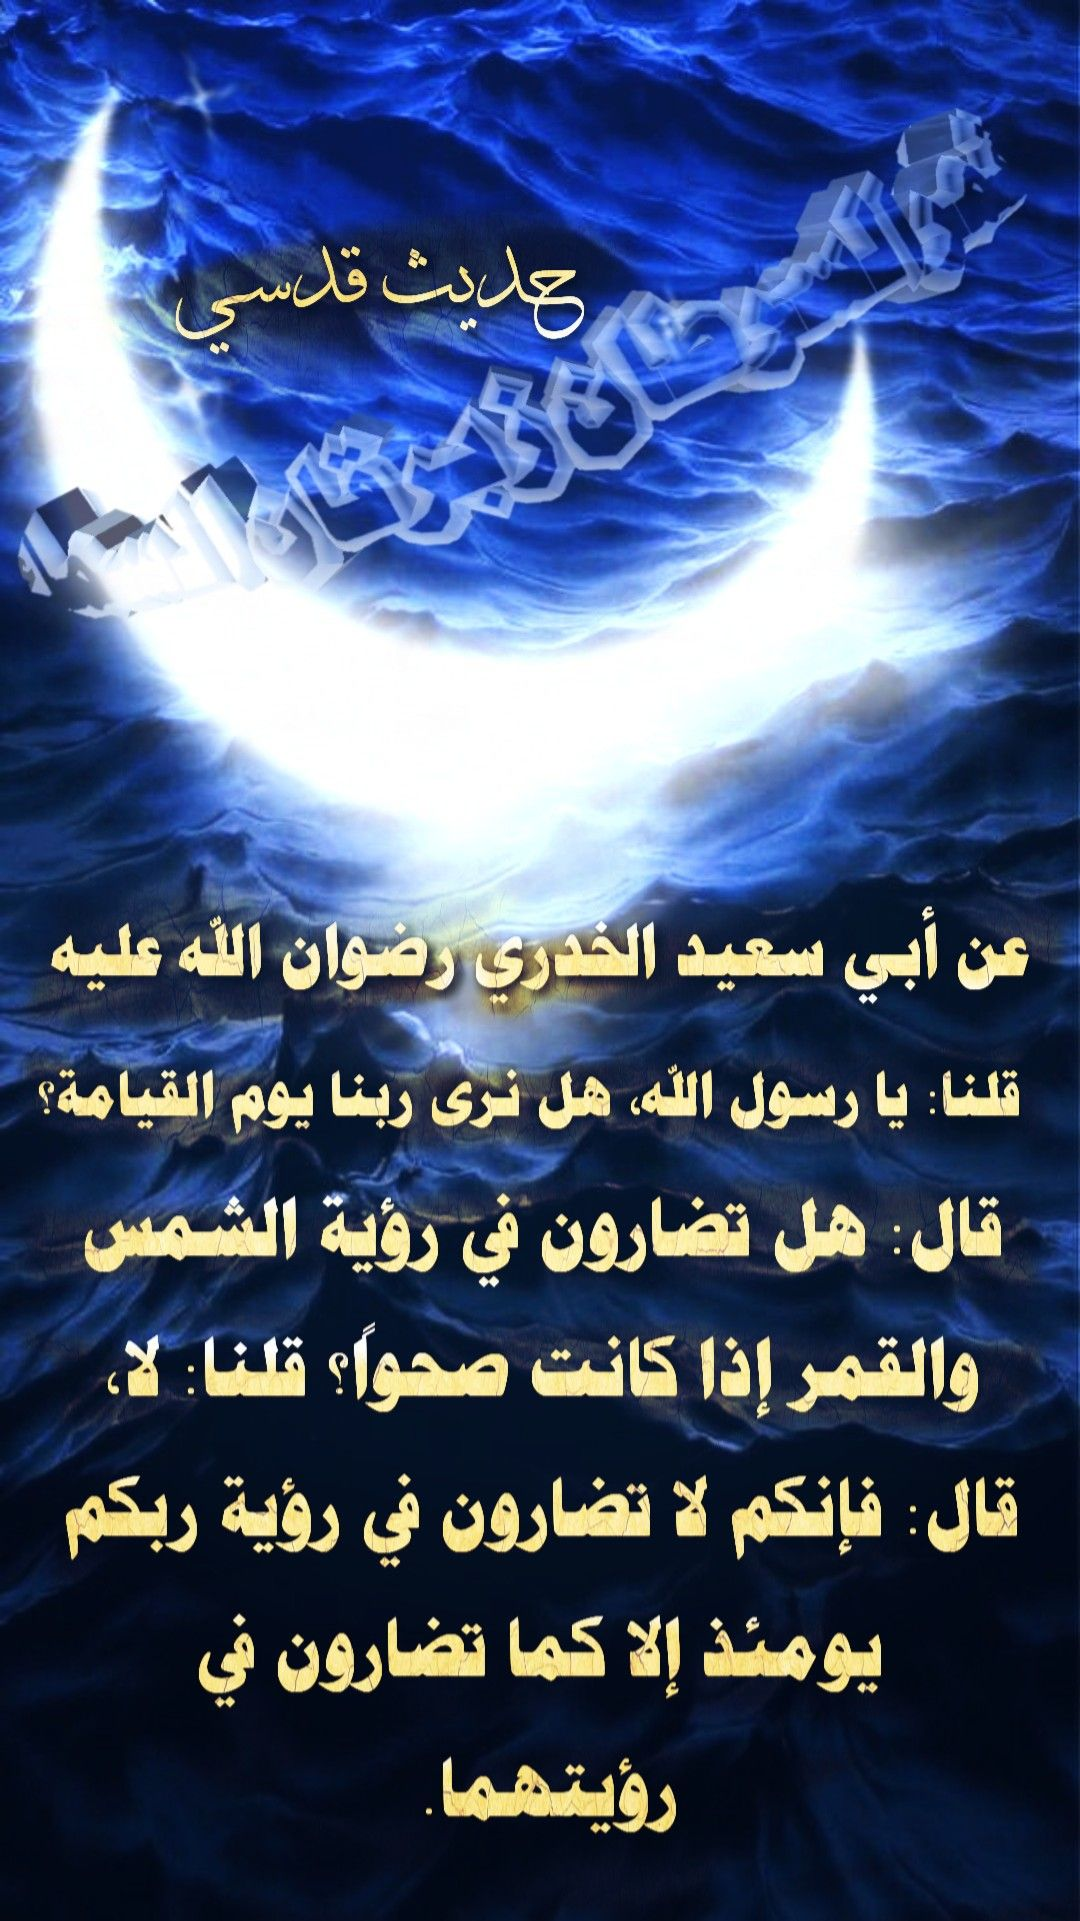 Pin By صياح الحمصي On محمد رسول الله صلى الله عليه واله Movie Posters Poster Movies